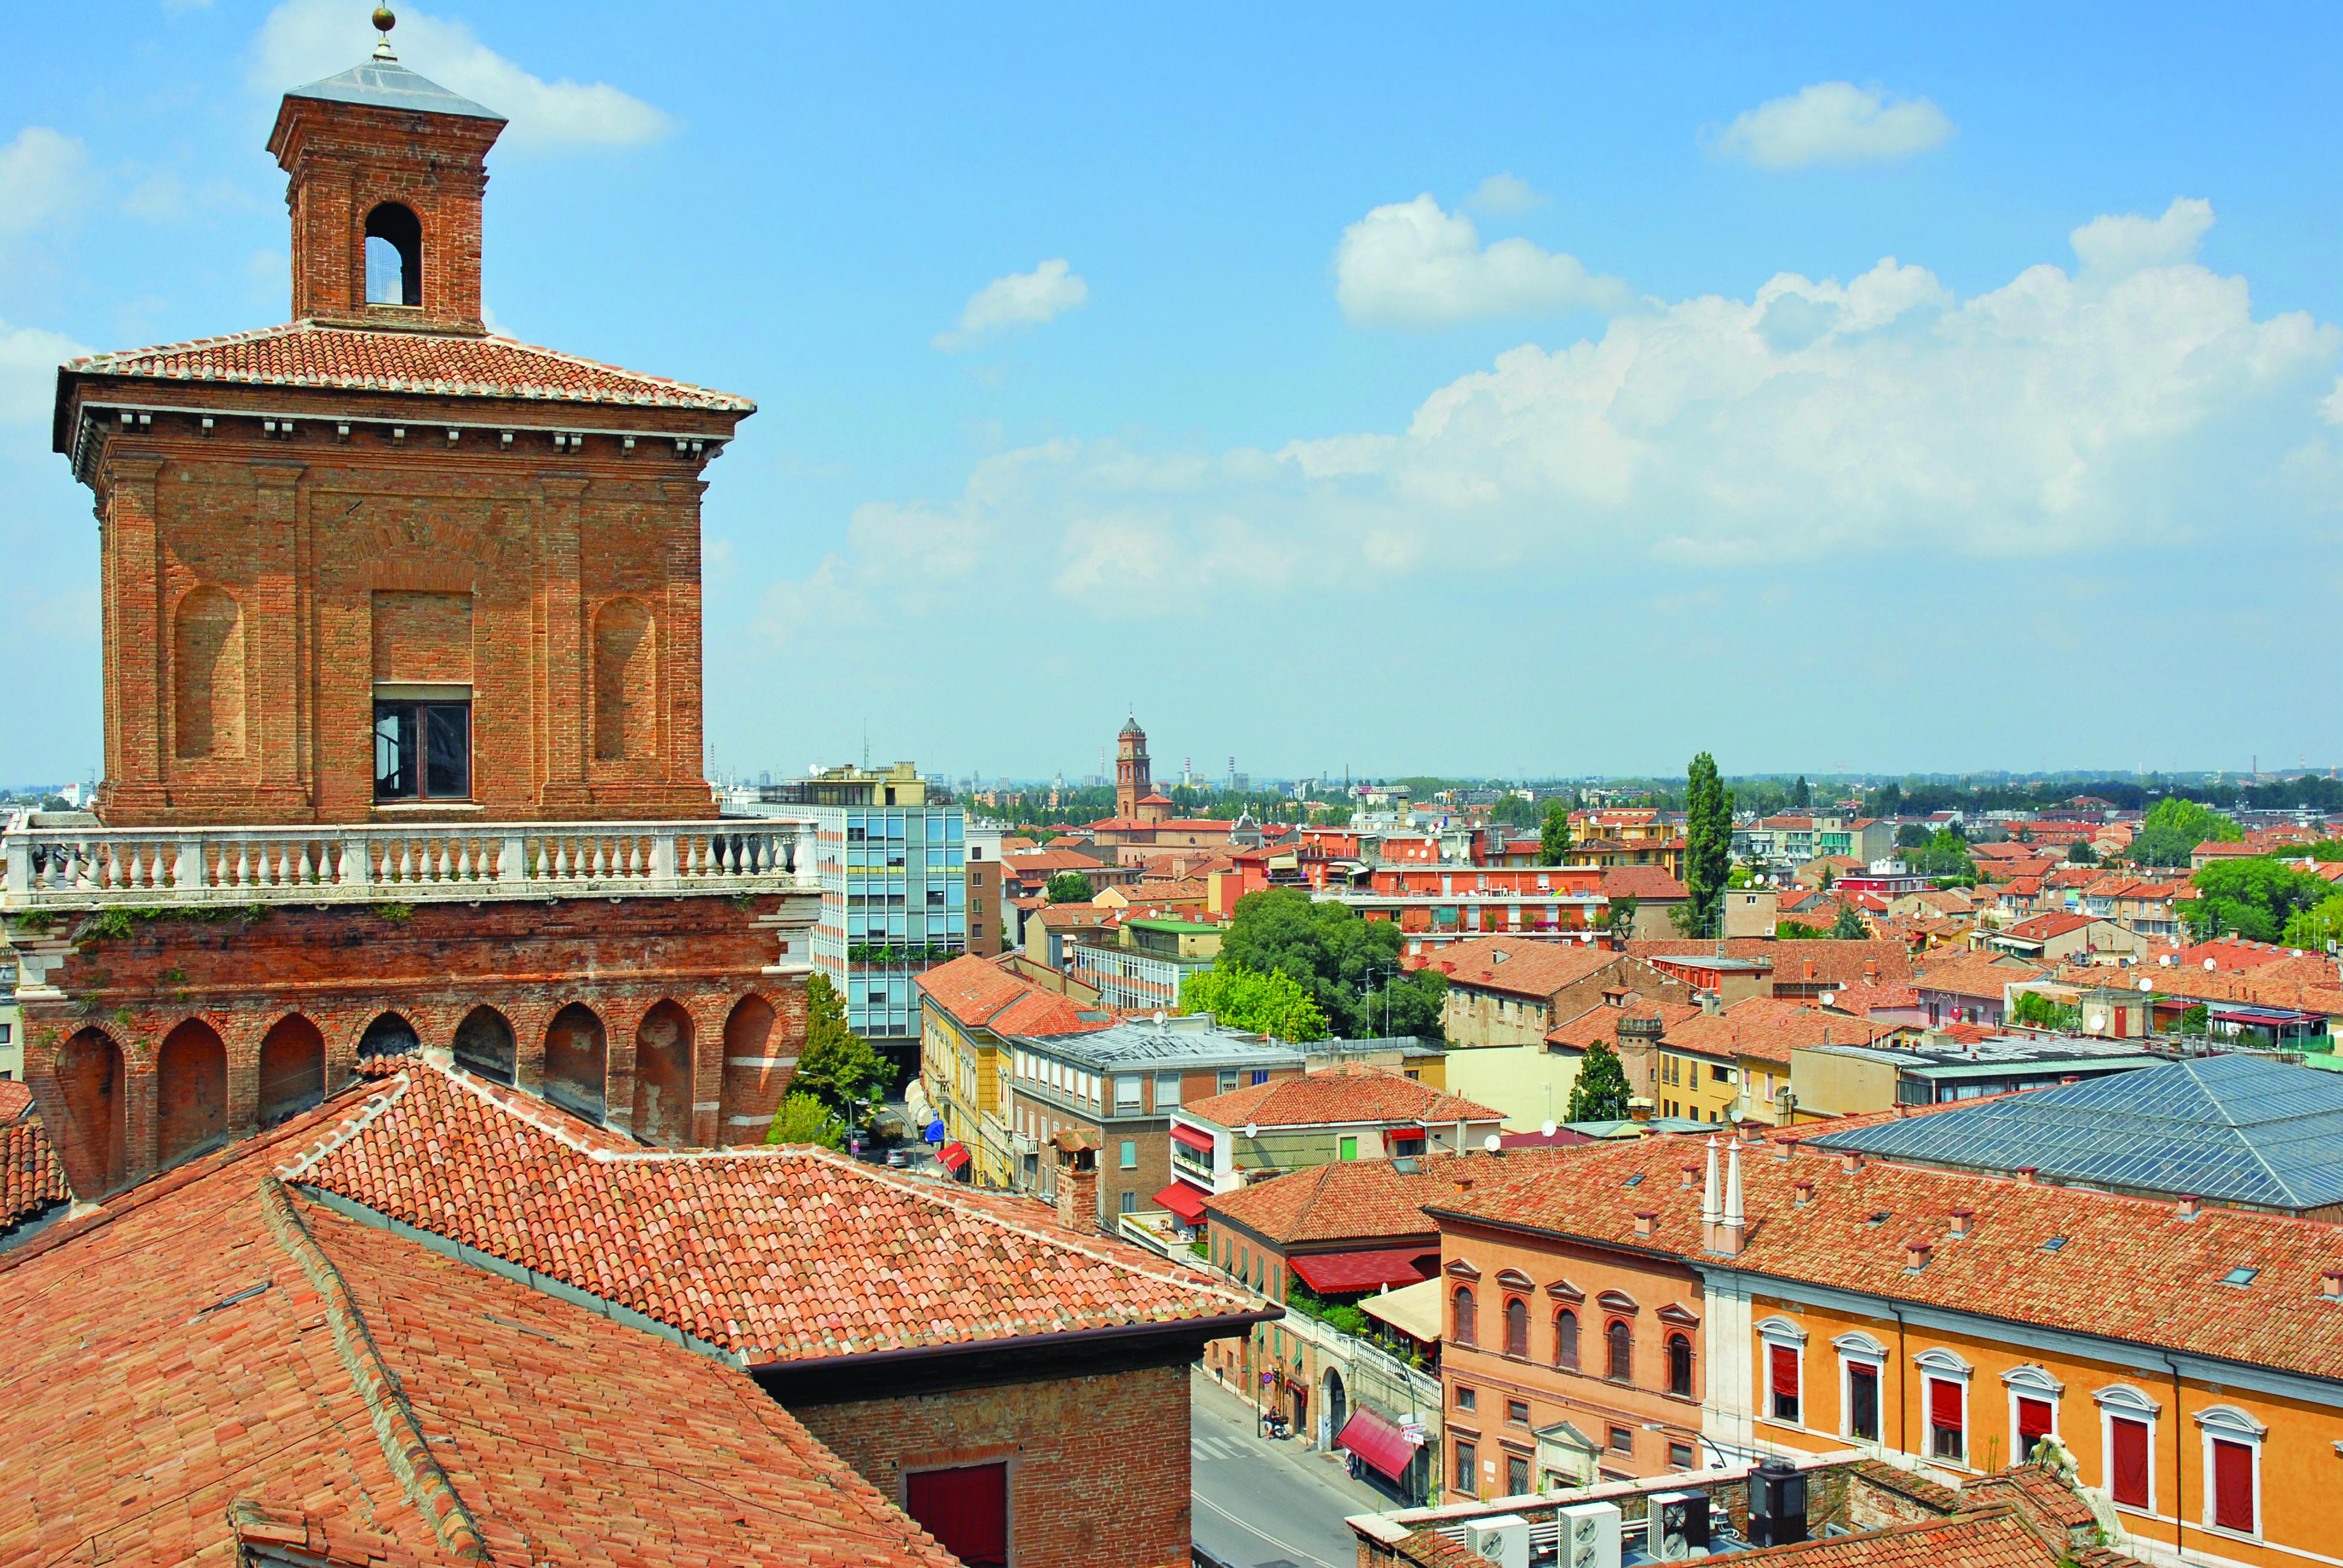 Summer Program - Italian | CIEE High School Summer Abroad: Italian Language & Culture in Ferrara, Italy